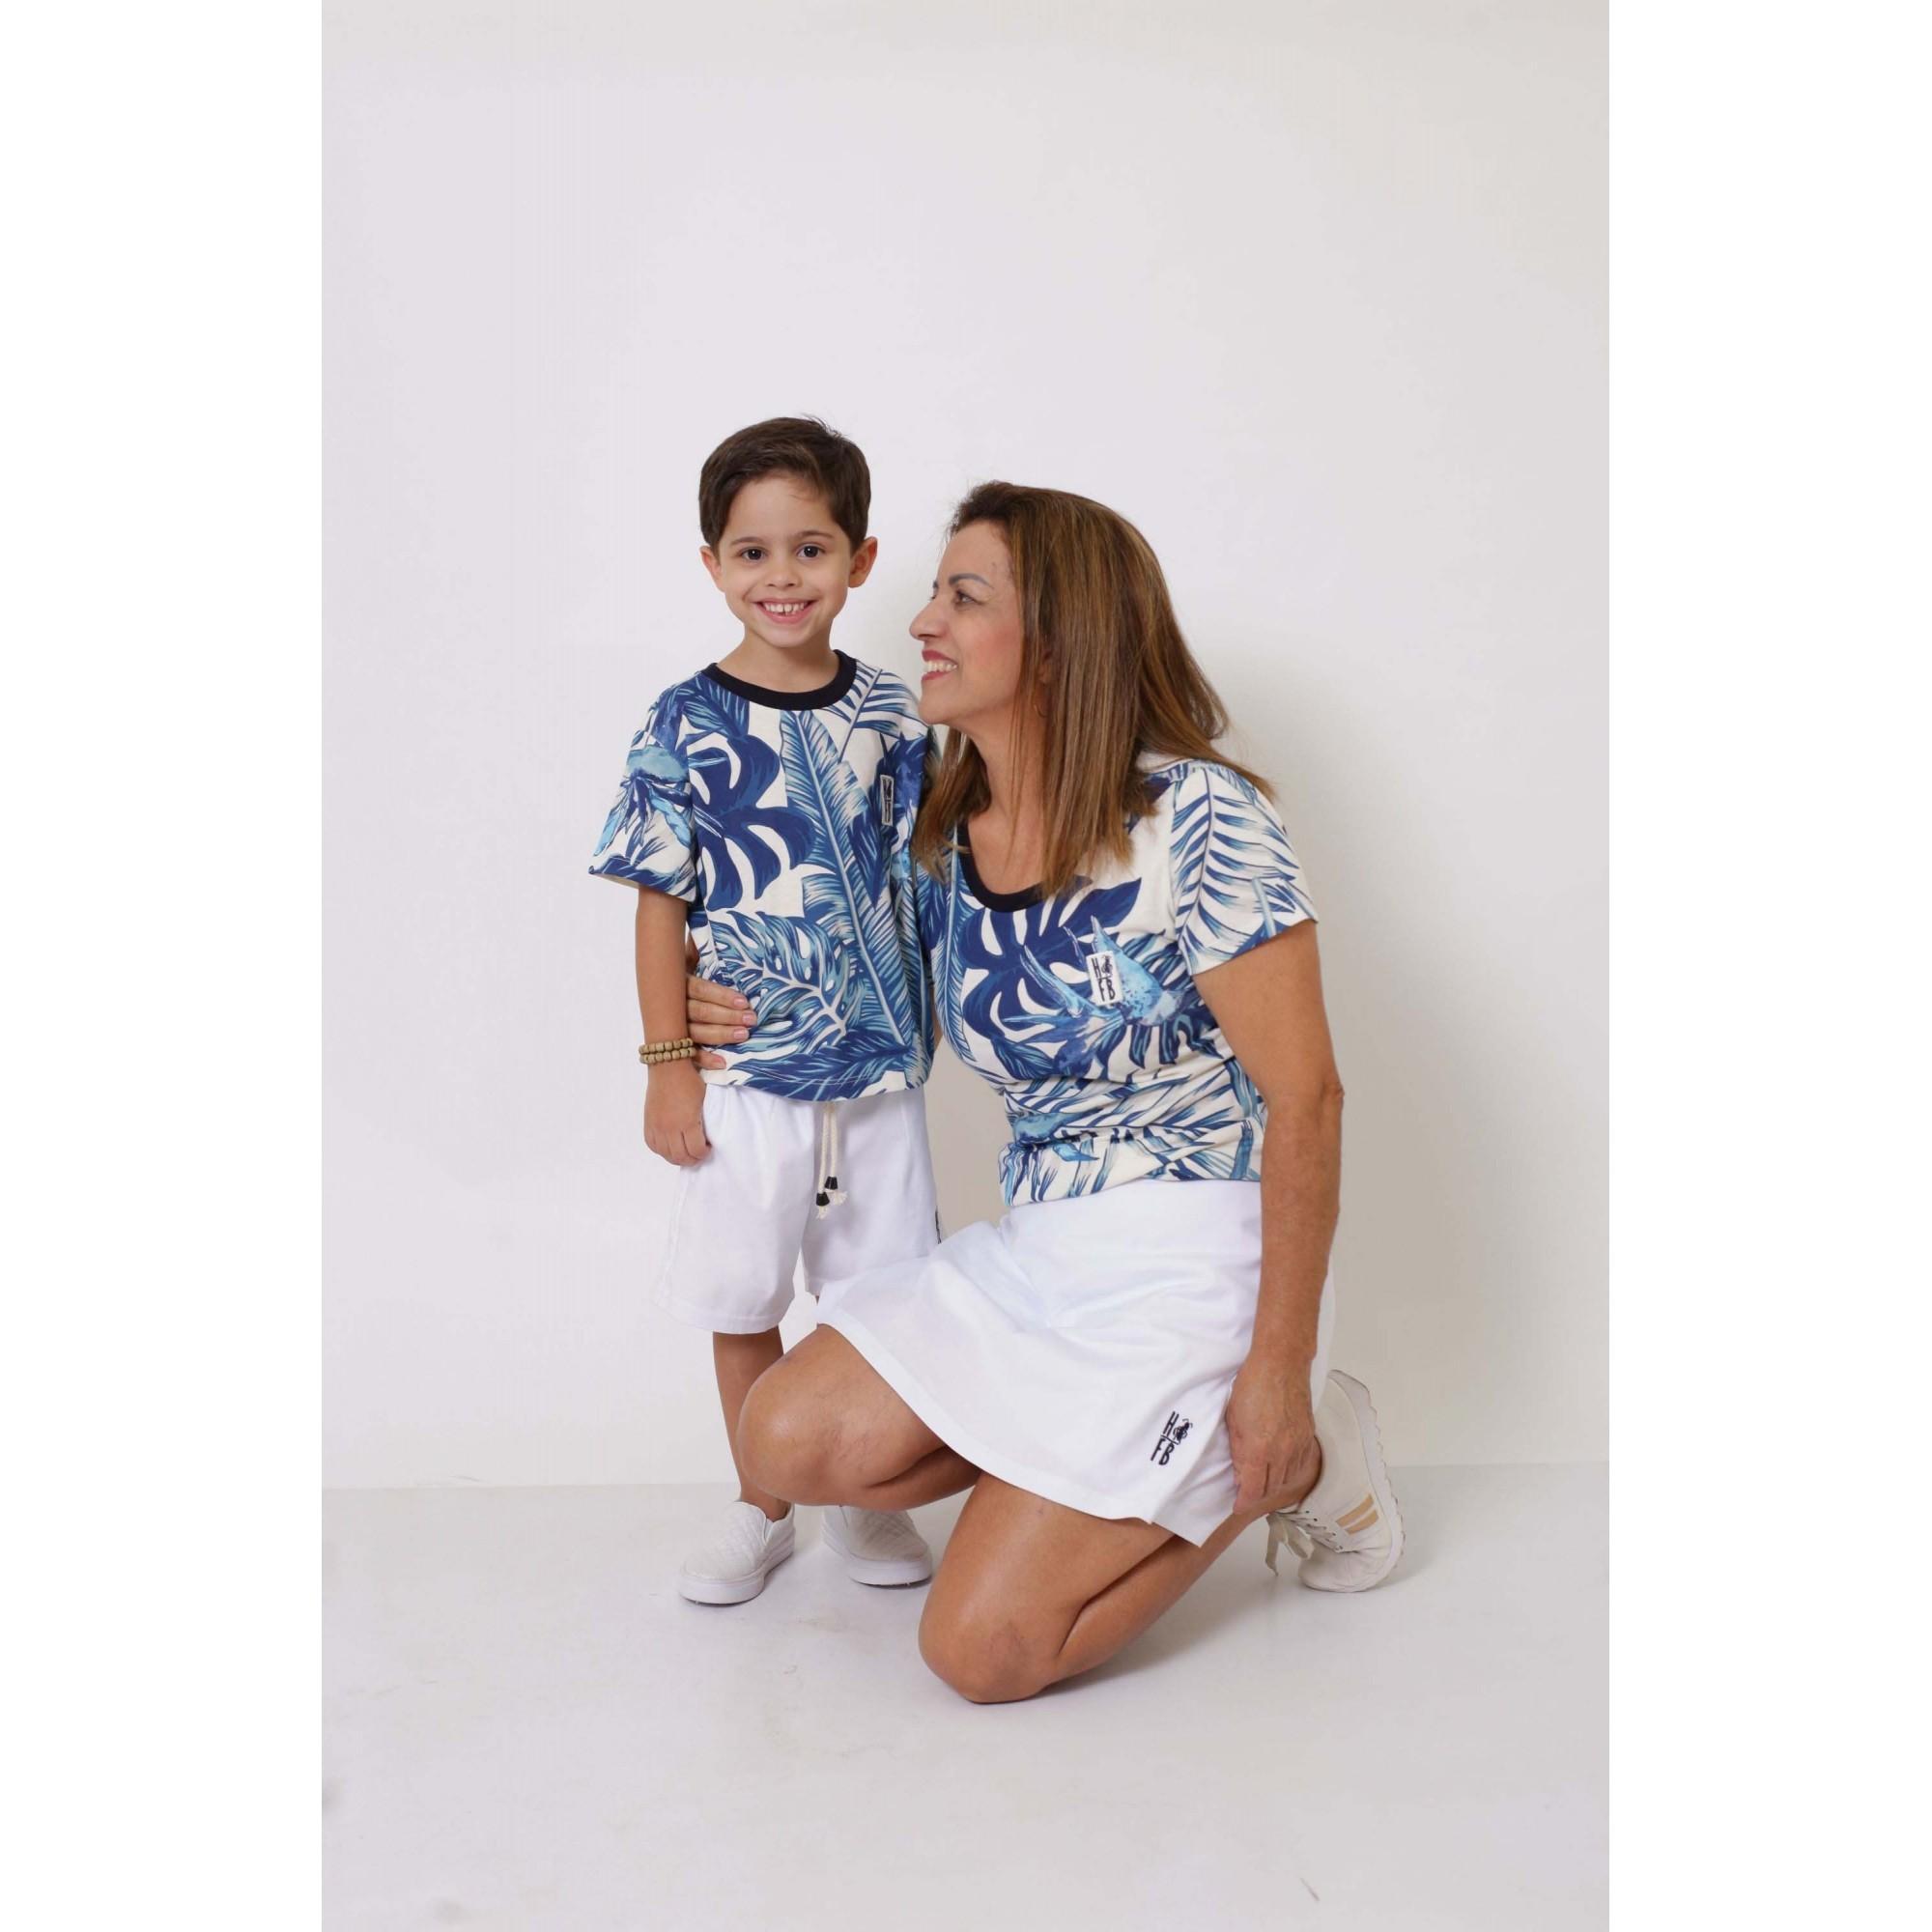 AVÓ E NETO > Kit 02 Peças T-Shirts - Caribe [Coleção Tal Avó Tal Neto]